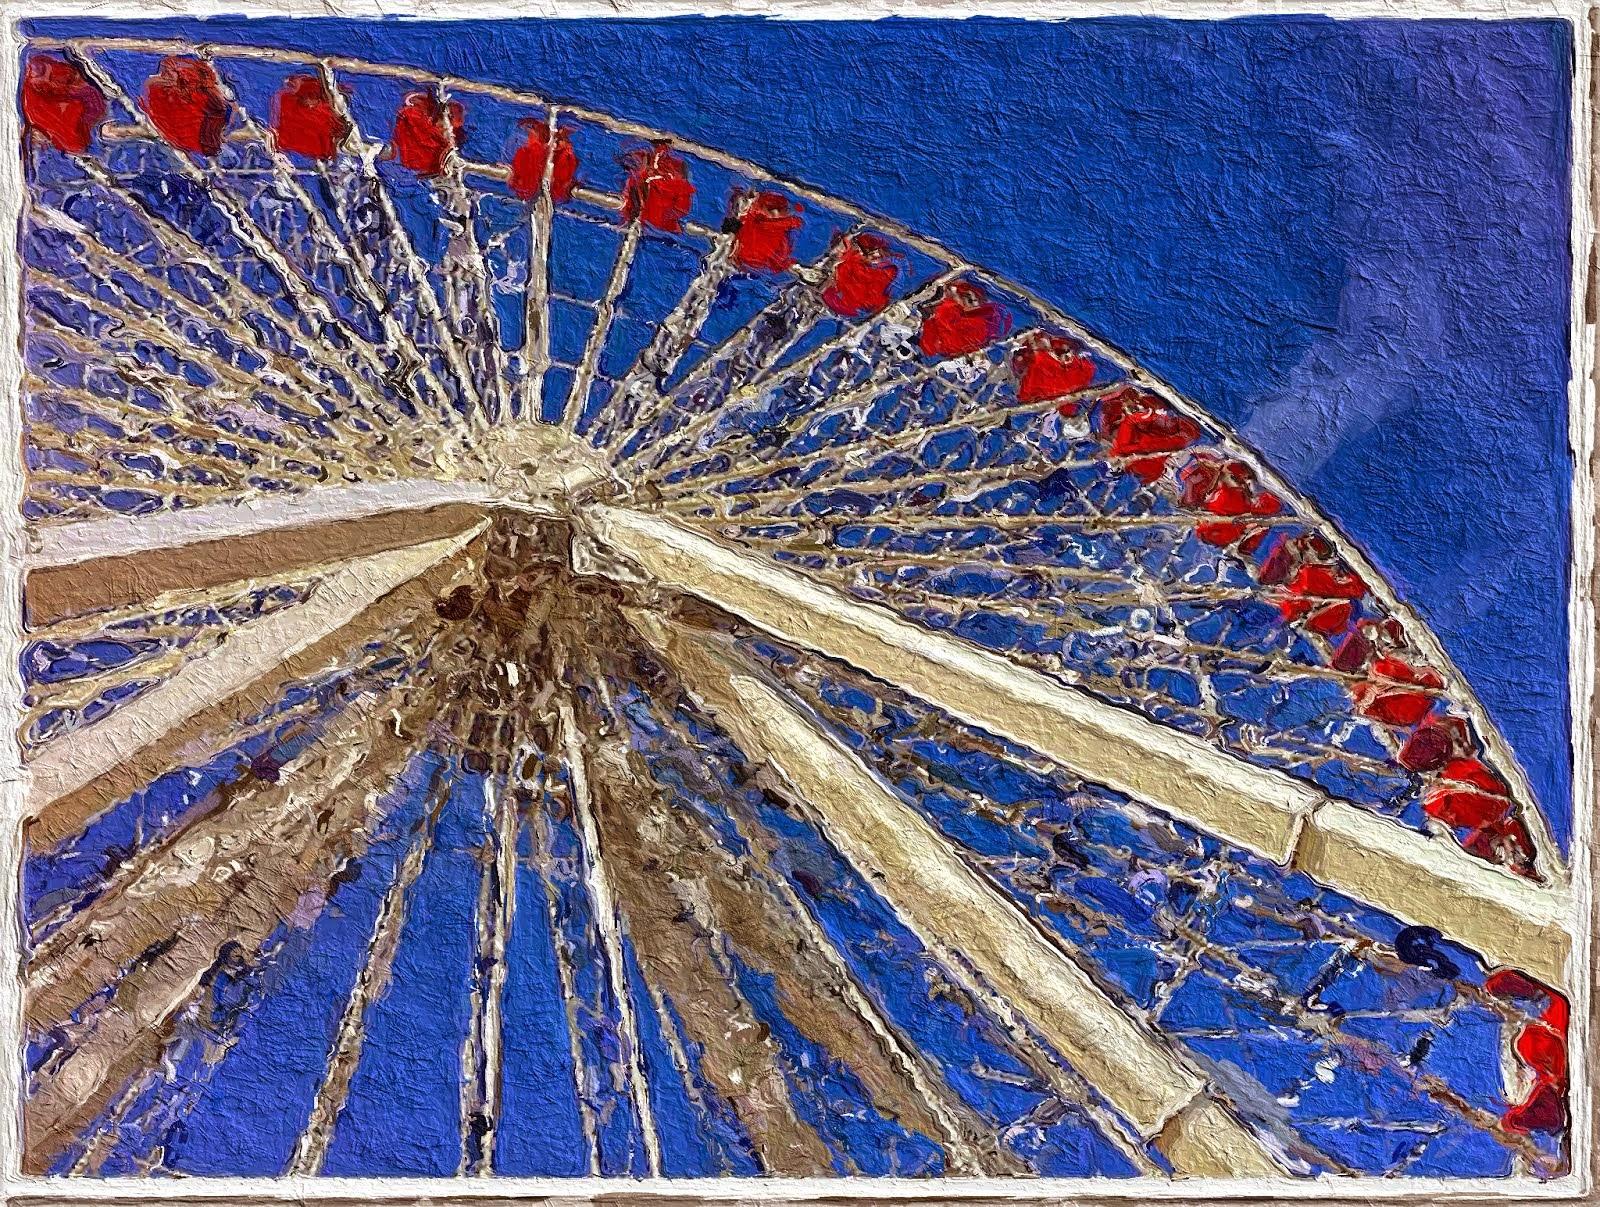 public domain paintings of a ferris wheel